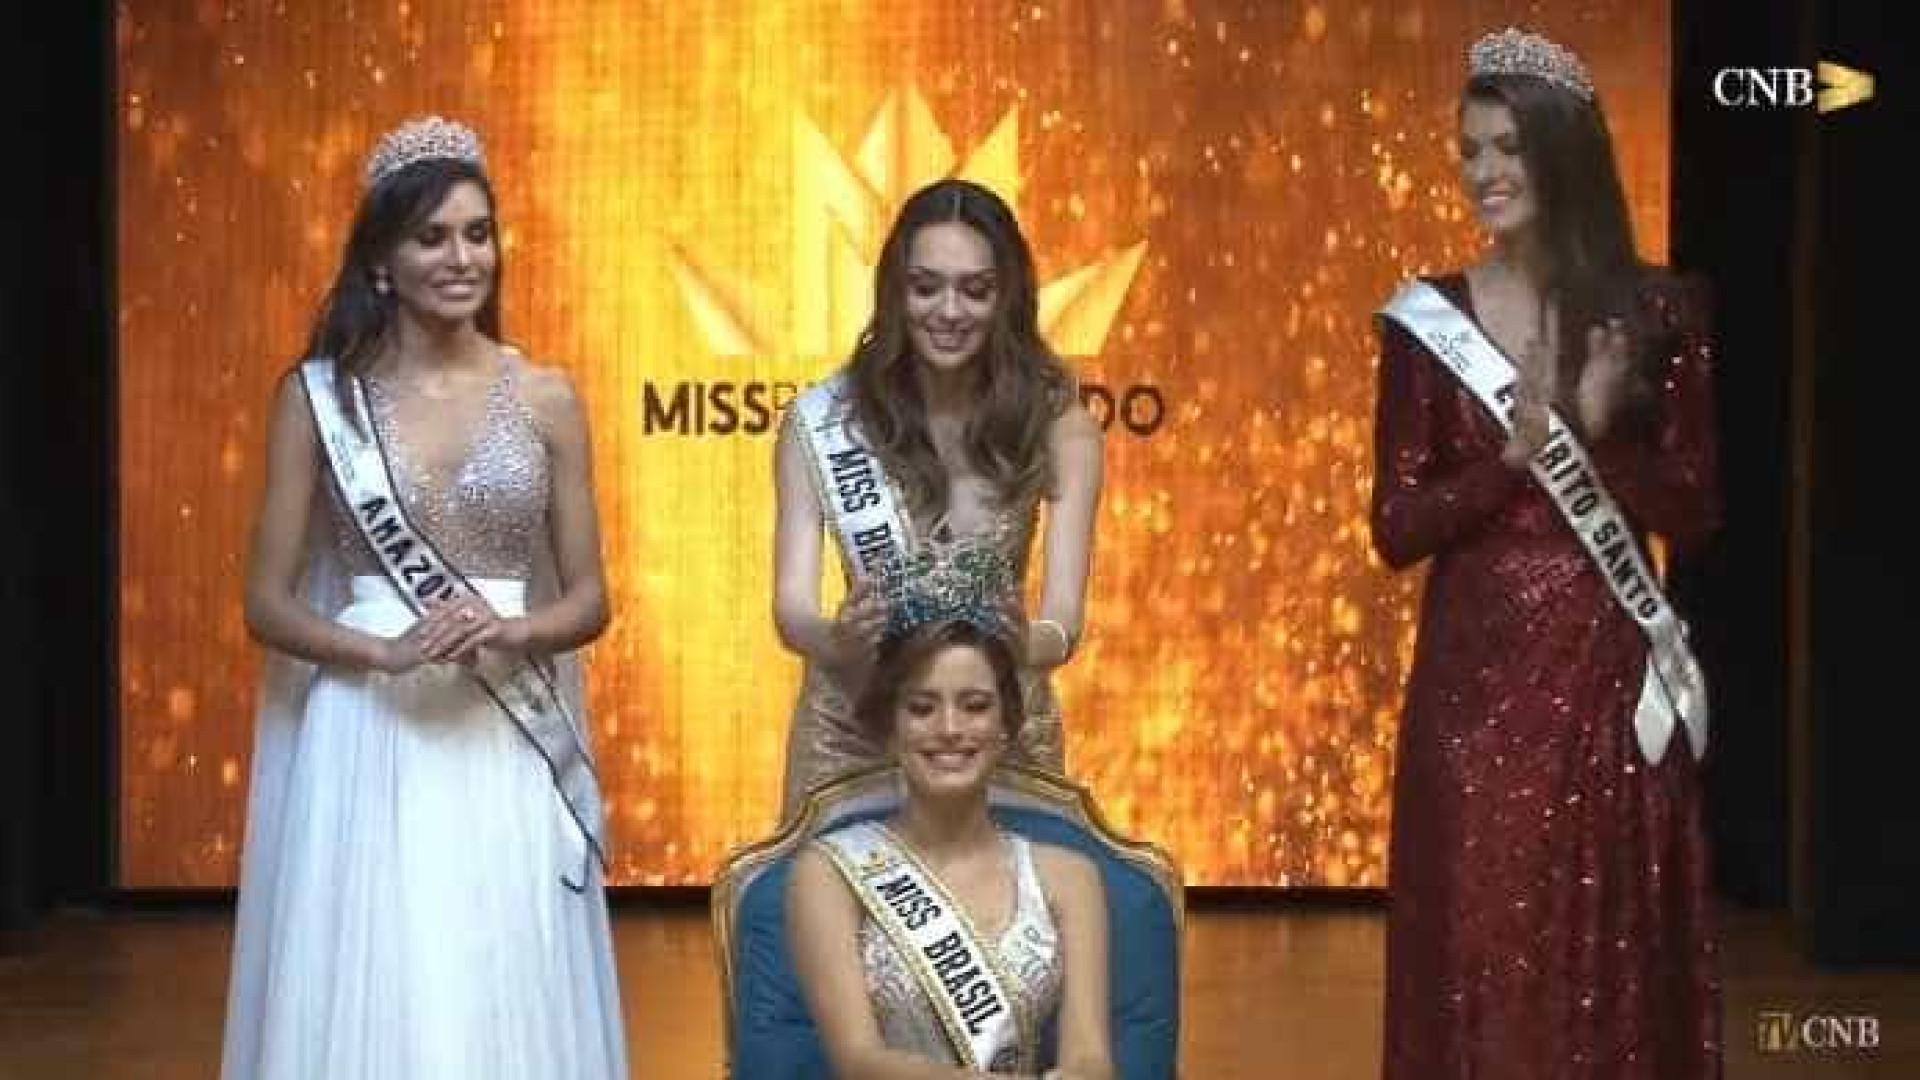 Piauí vence Miss Brasil Mundo 2018 e leva título pela primeira vez